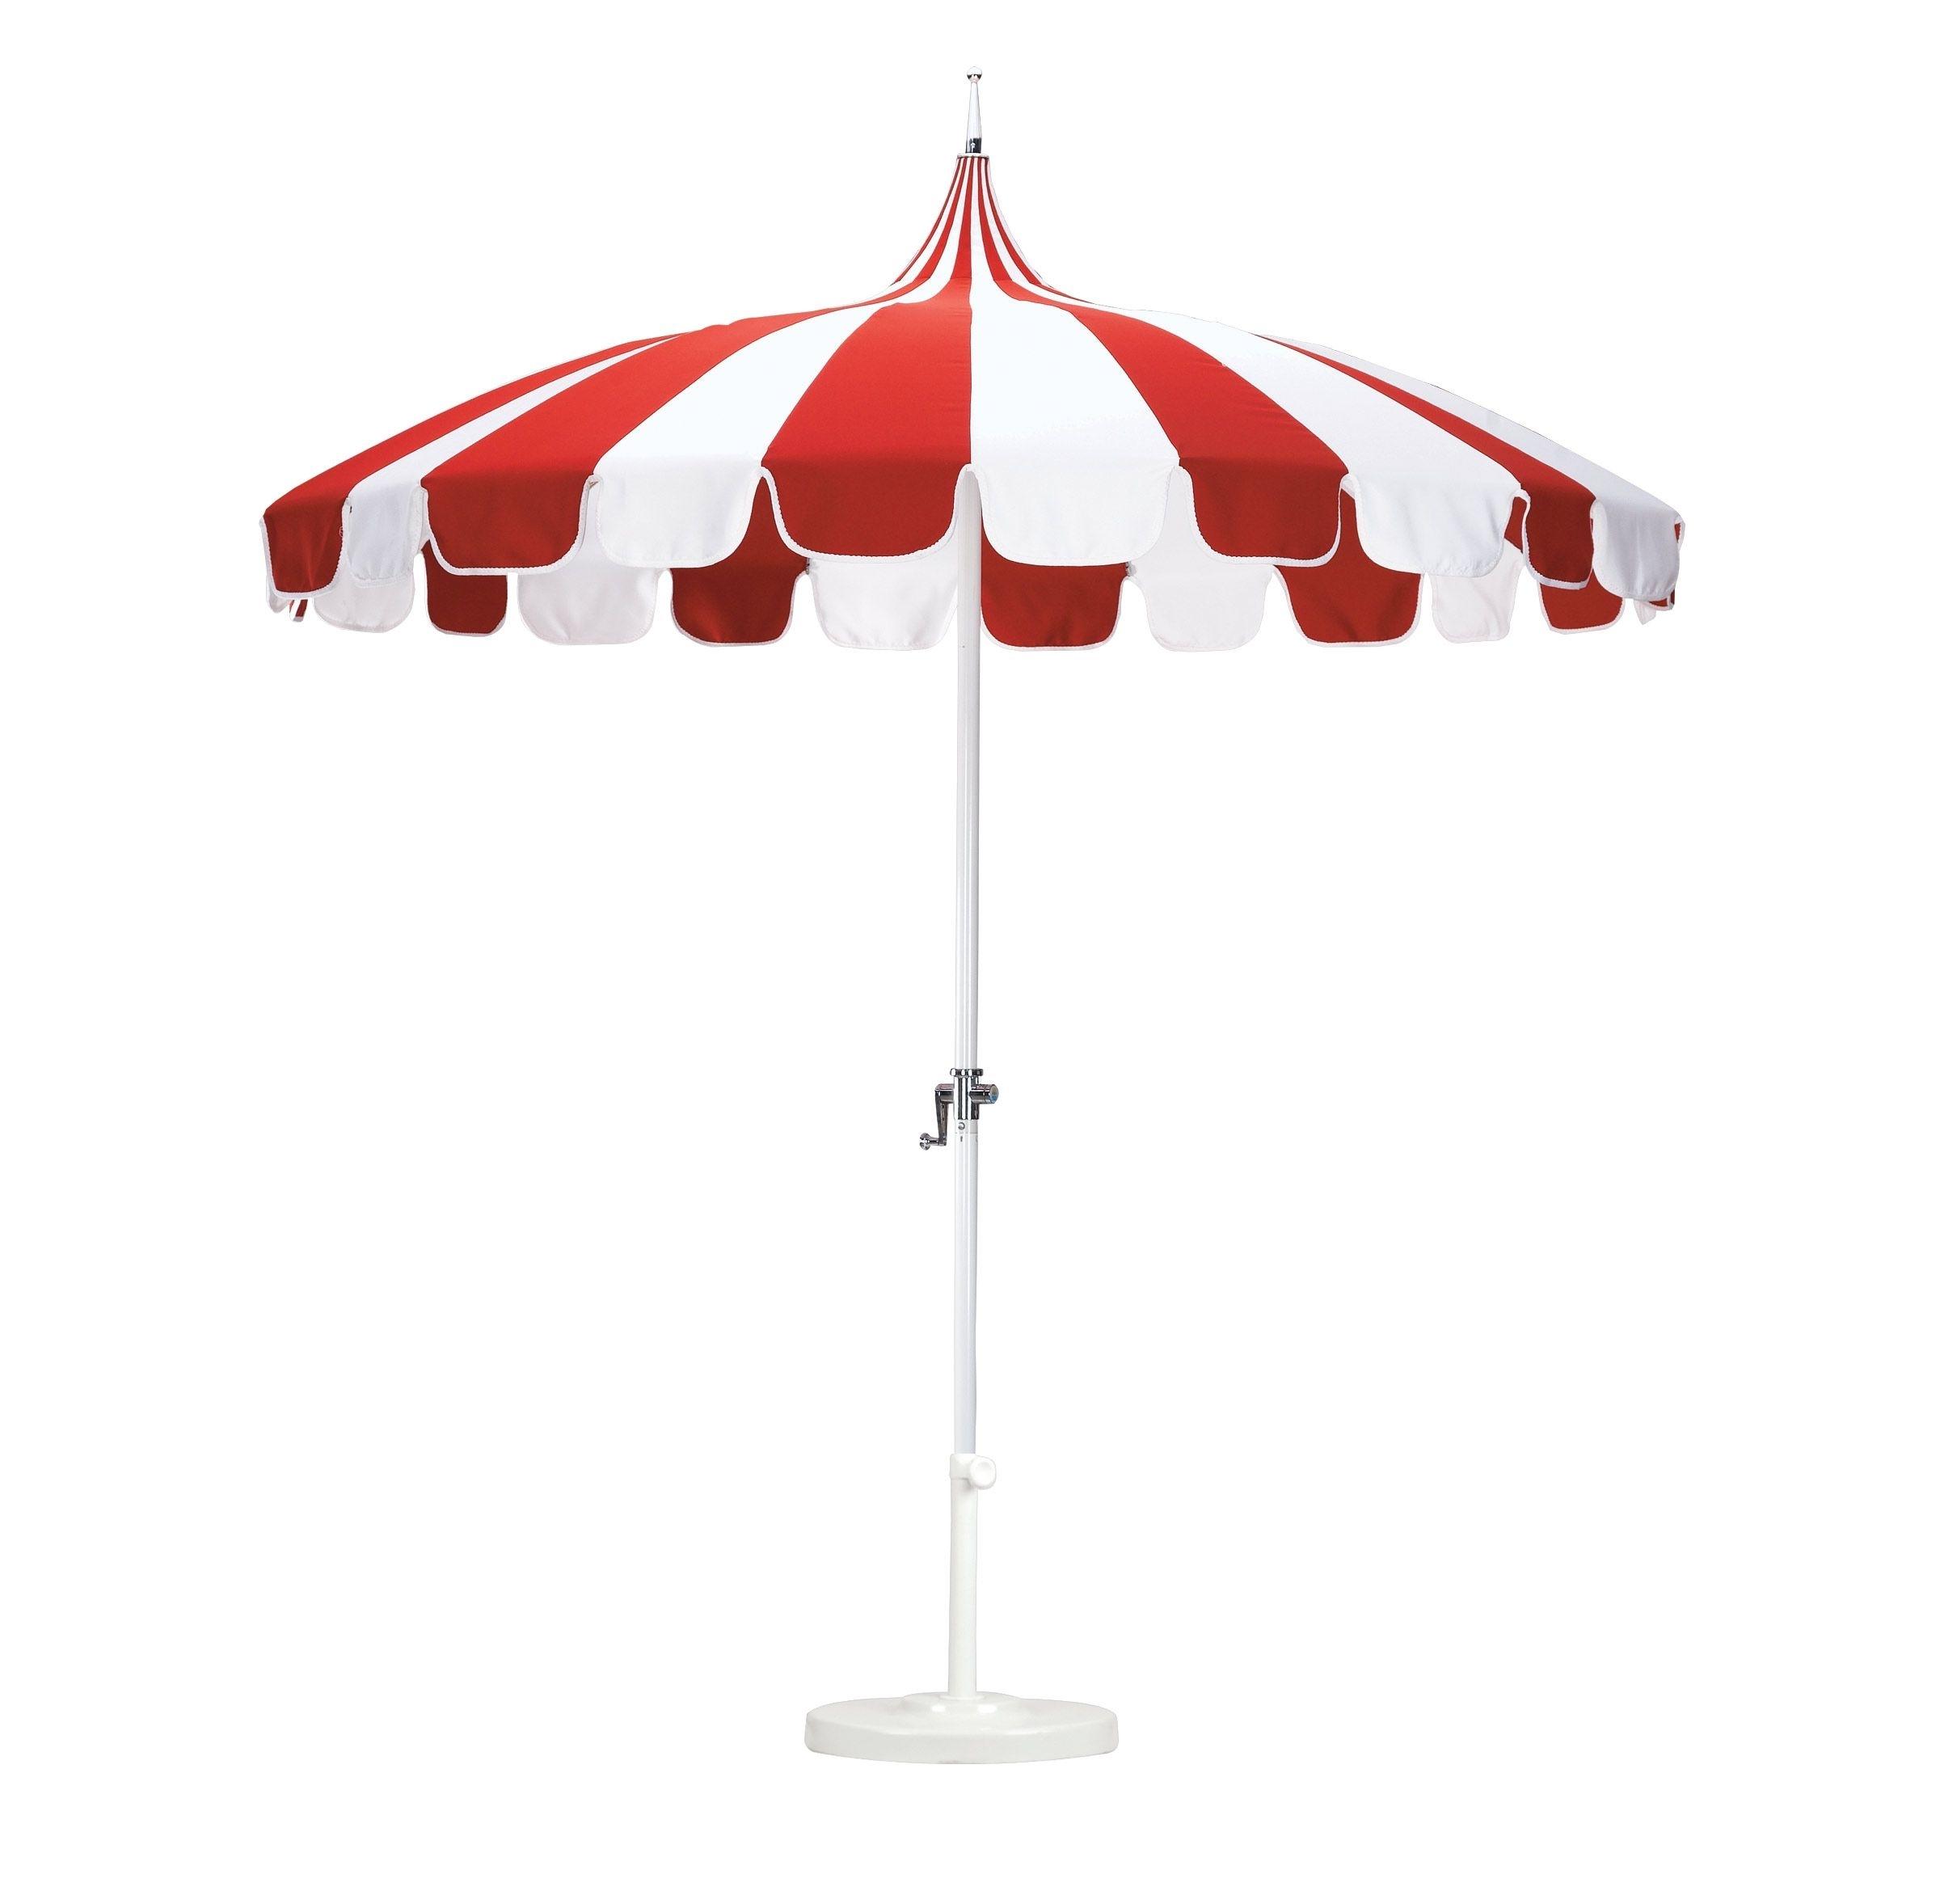 Sunbrella Patio Umbrella Look More At Http://besthomezone With Regard To Most Current Sunbrella Patio Umbrellas (View 11 of 20)